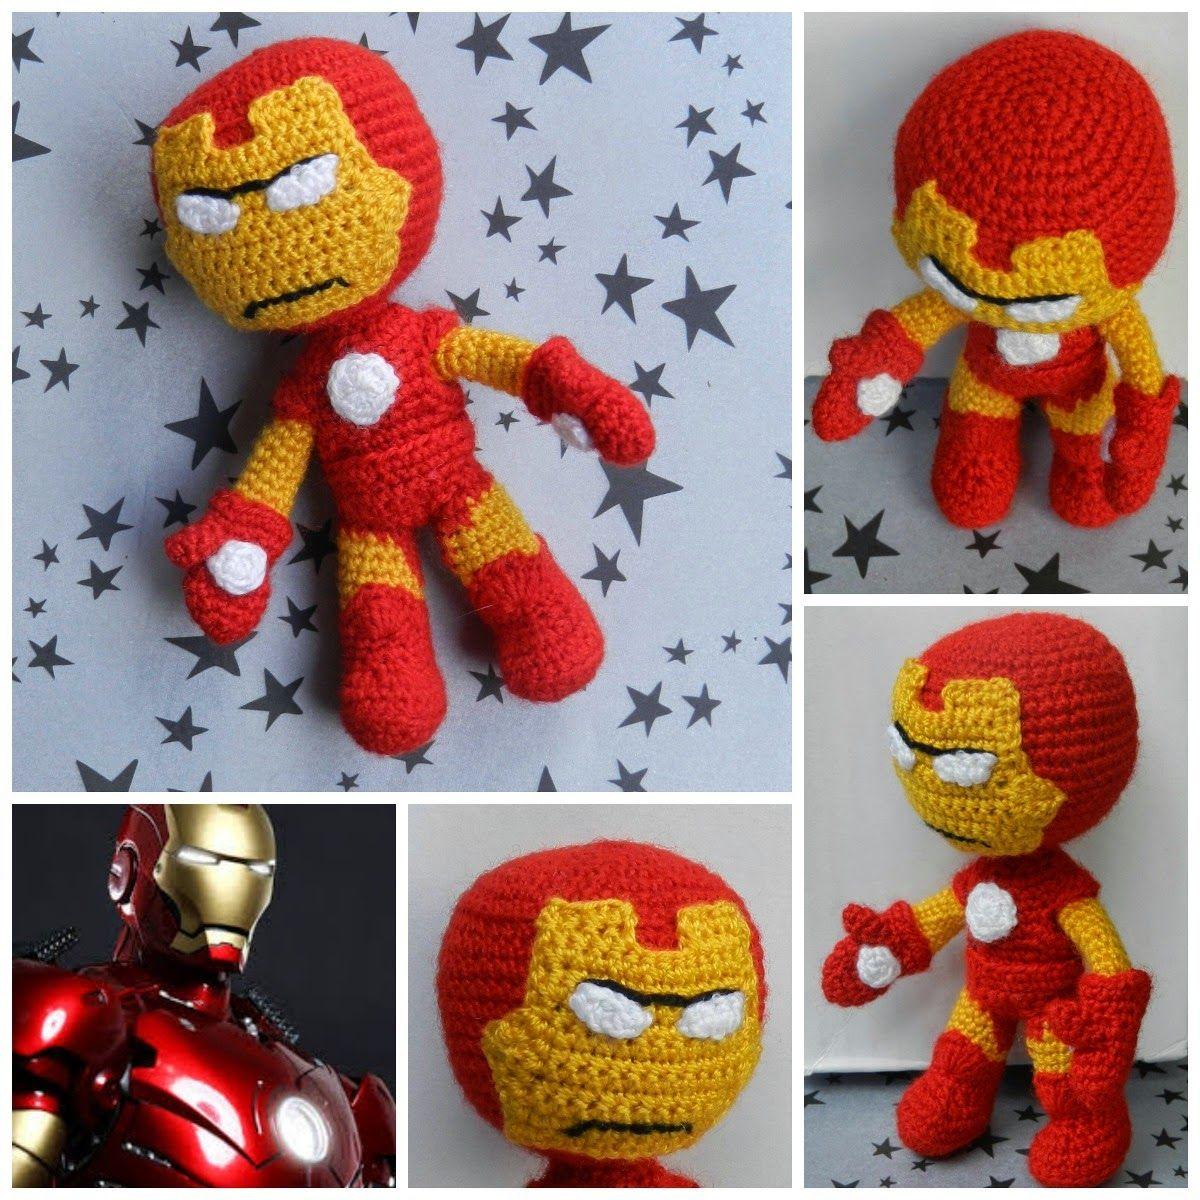 daxa rabalea: Iron Man amigurumi - patrón gratis | Amigurrumis ...